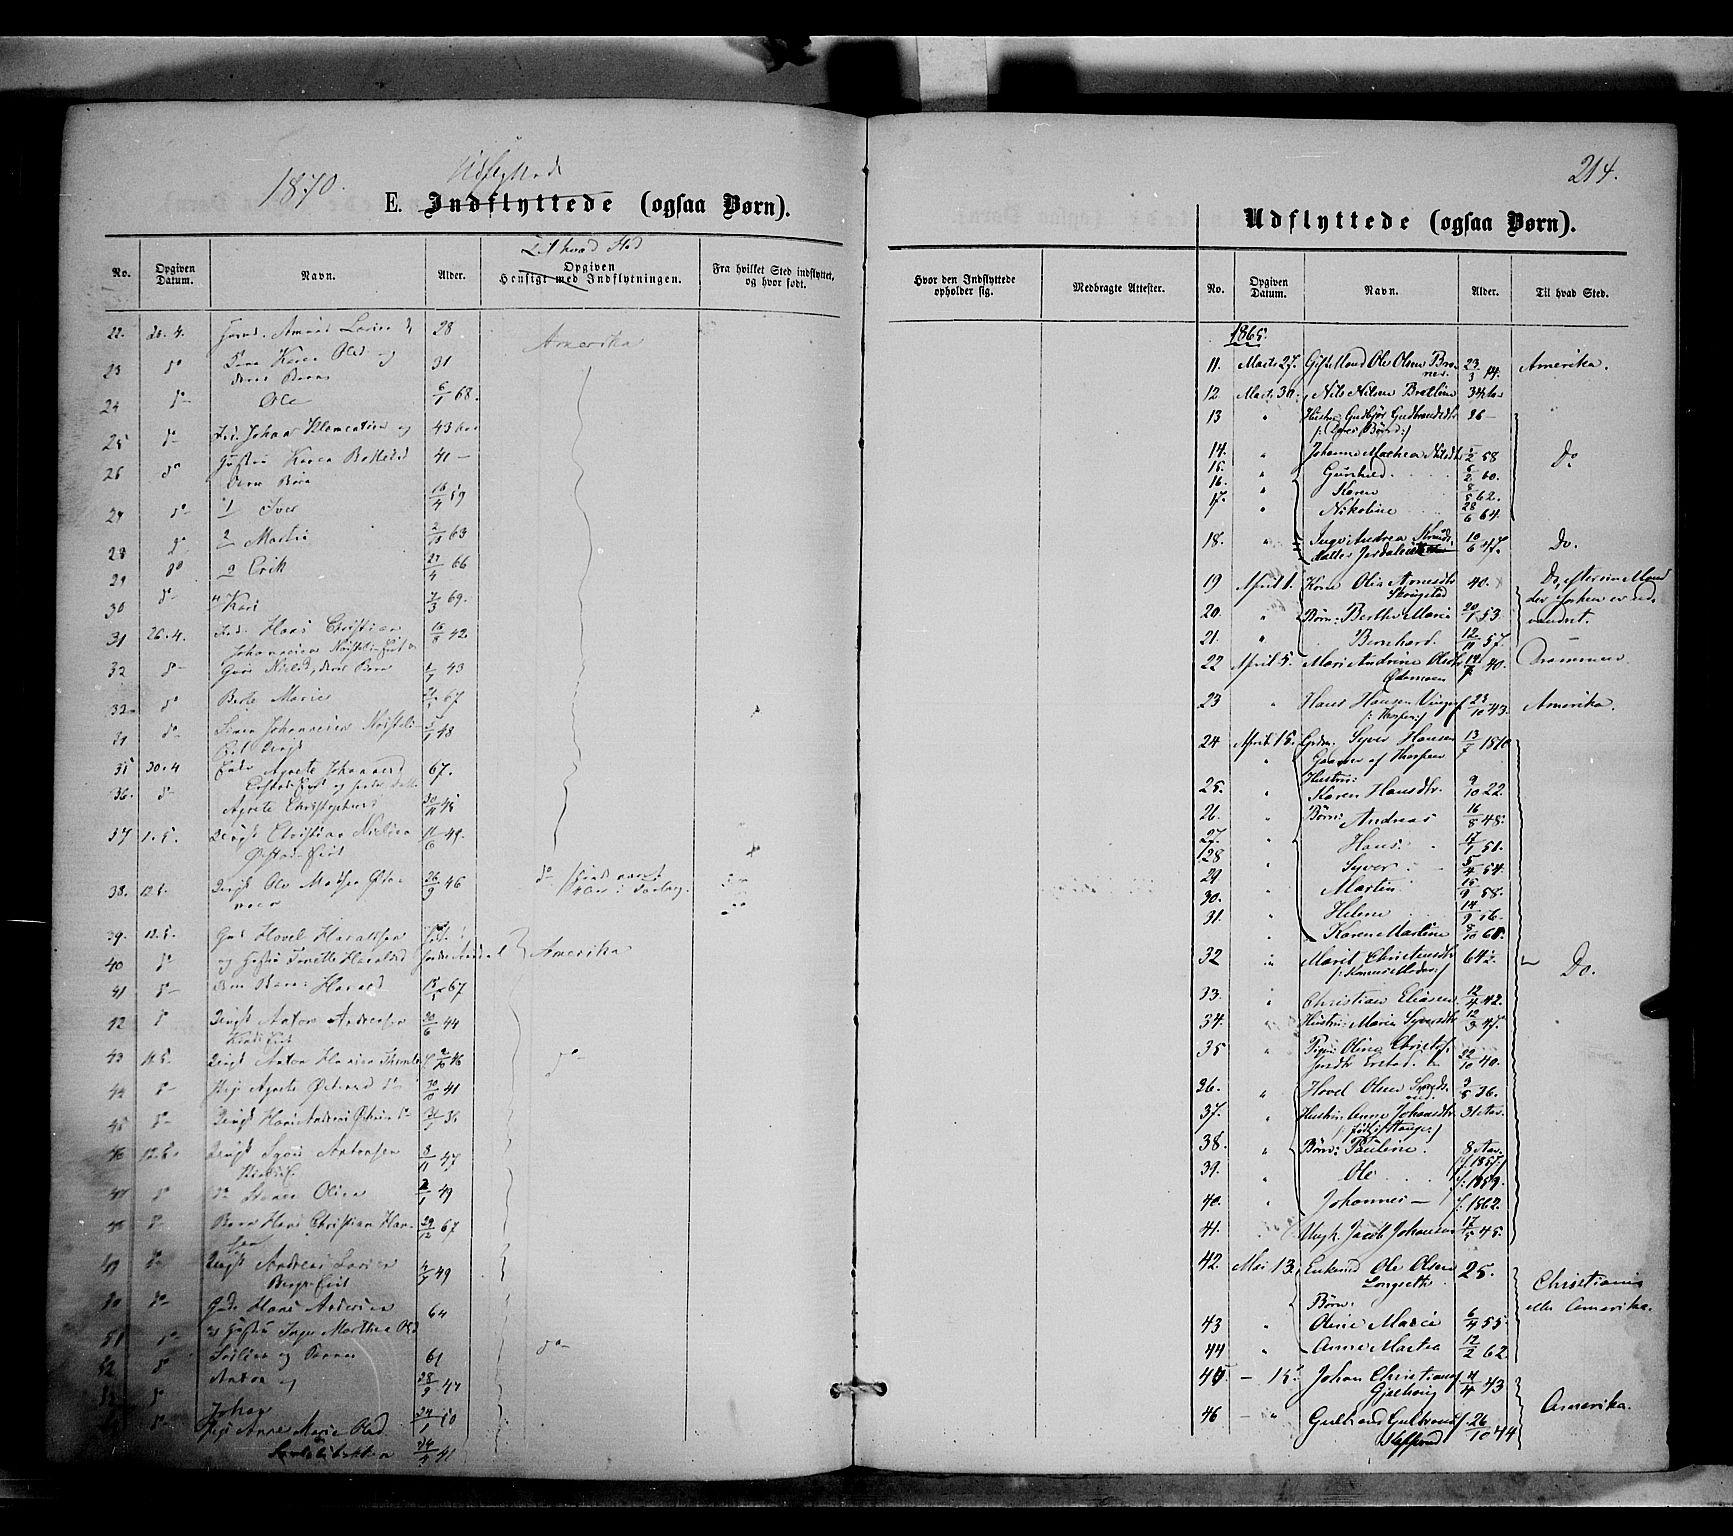 SAH, Nordre Land prestekontor, Ministerialbok nr. 1, 1860-1871, s. 214